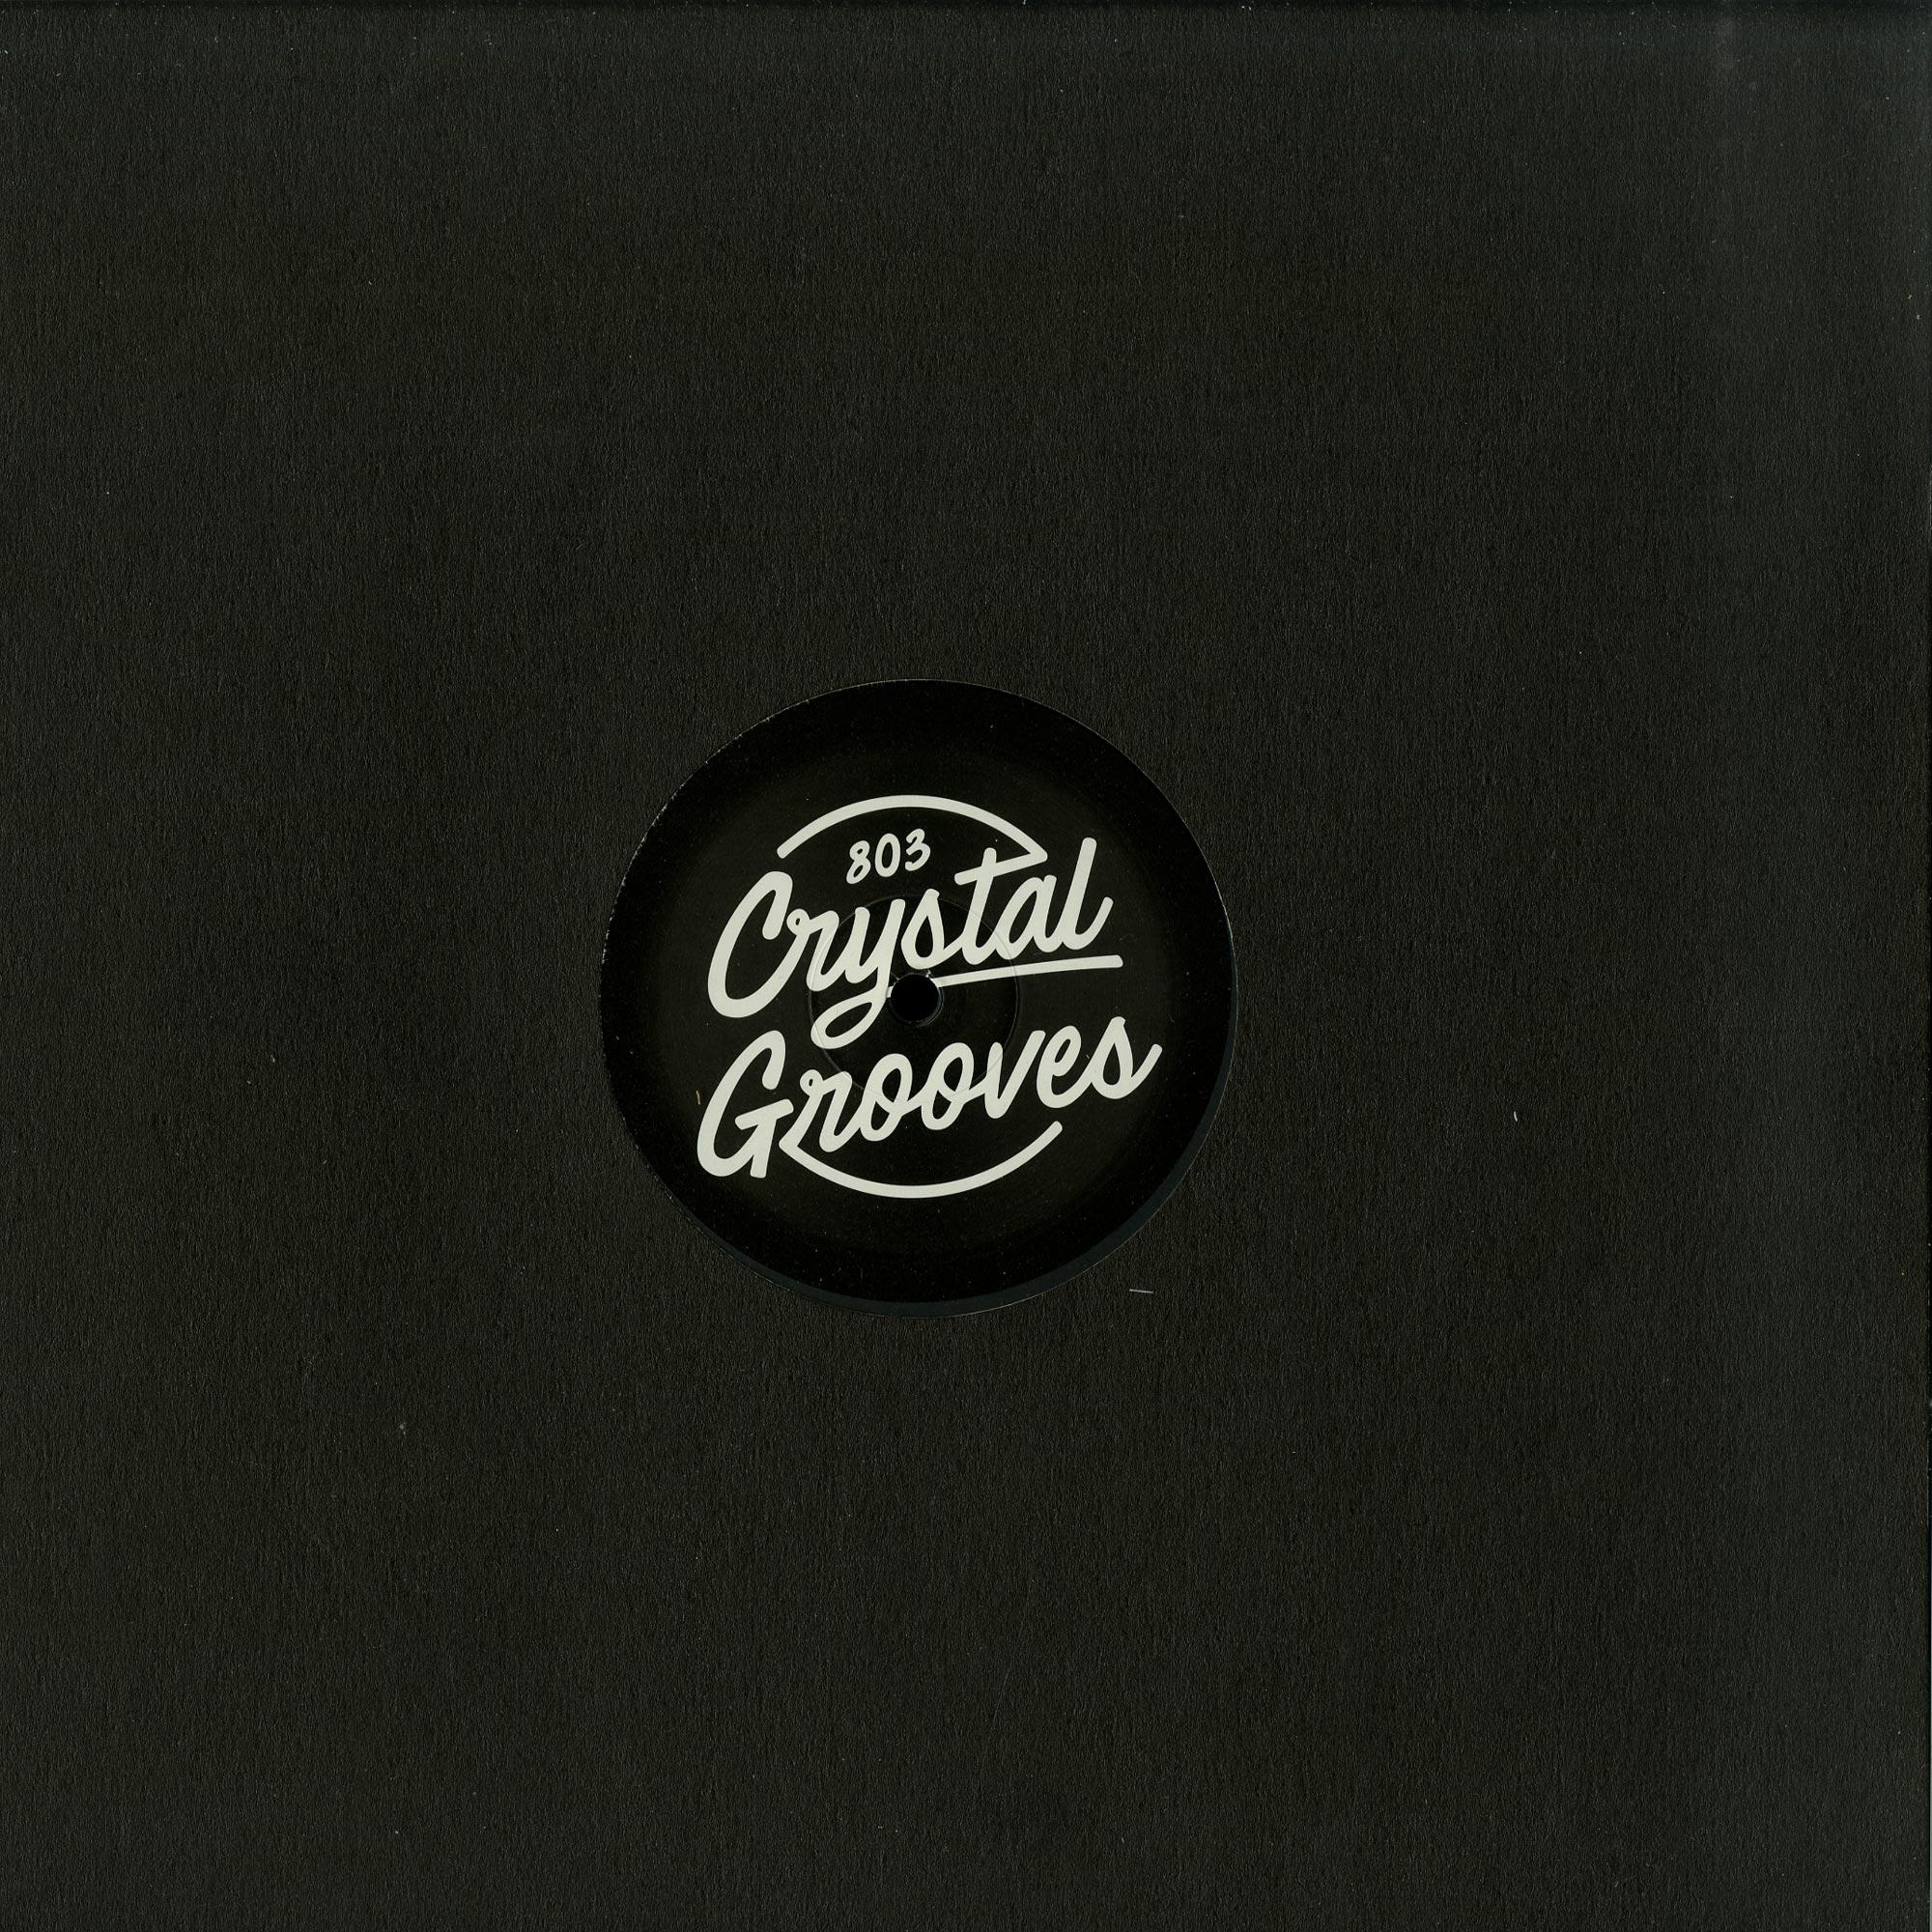 Cinthie - 803 CRYSTALGROOVES 002